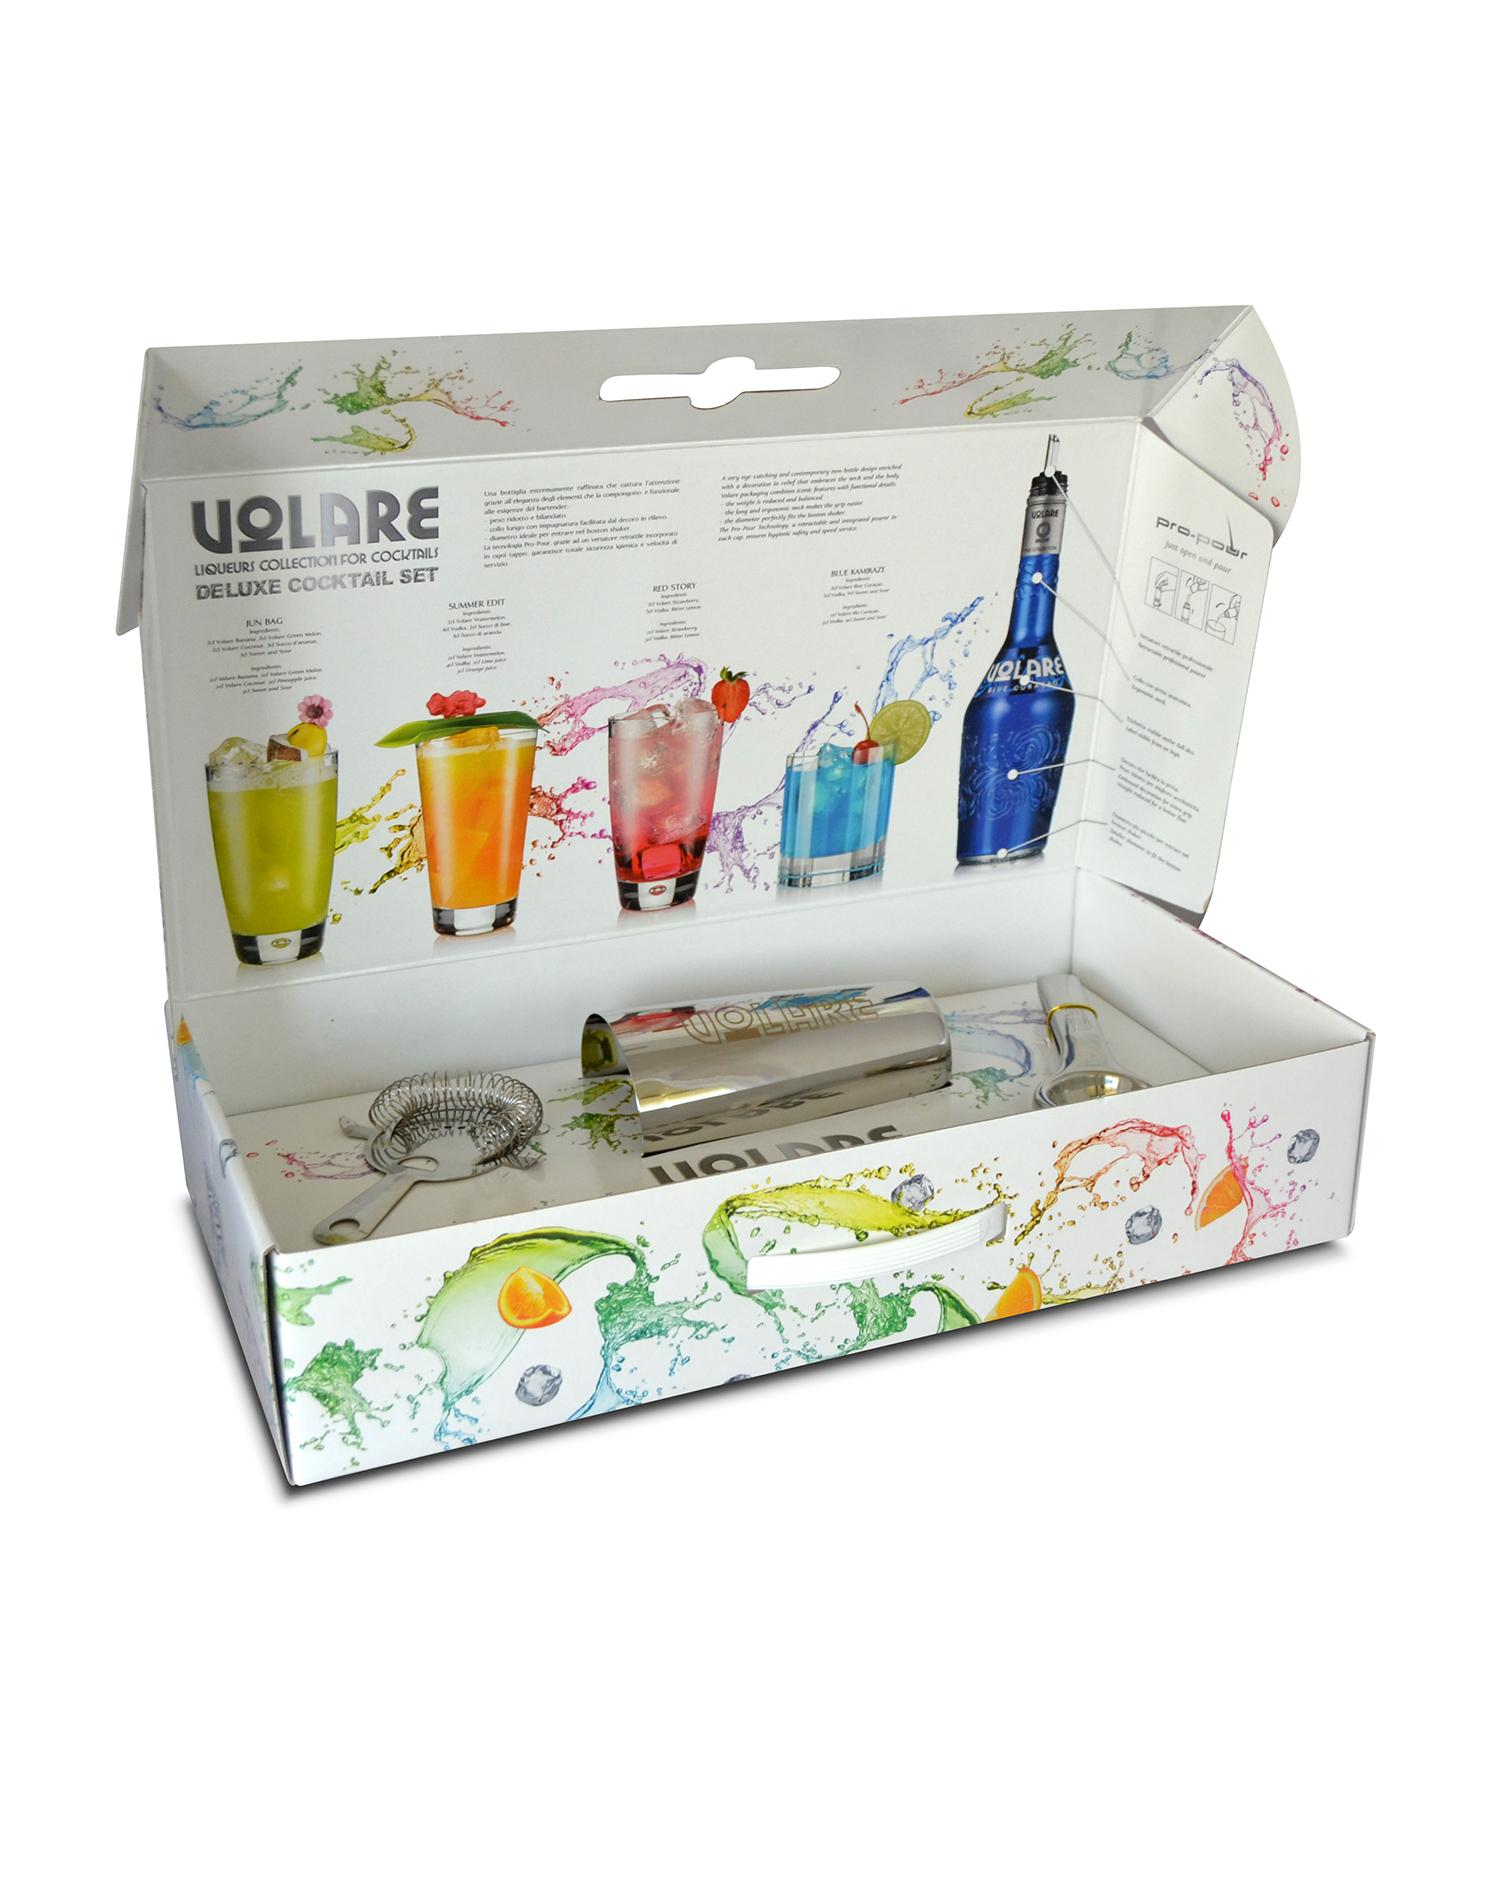 Valigetta Volare Cocktail kit